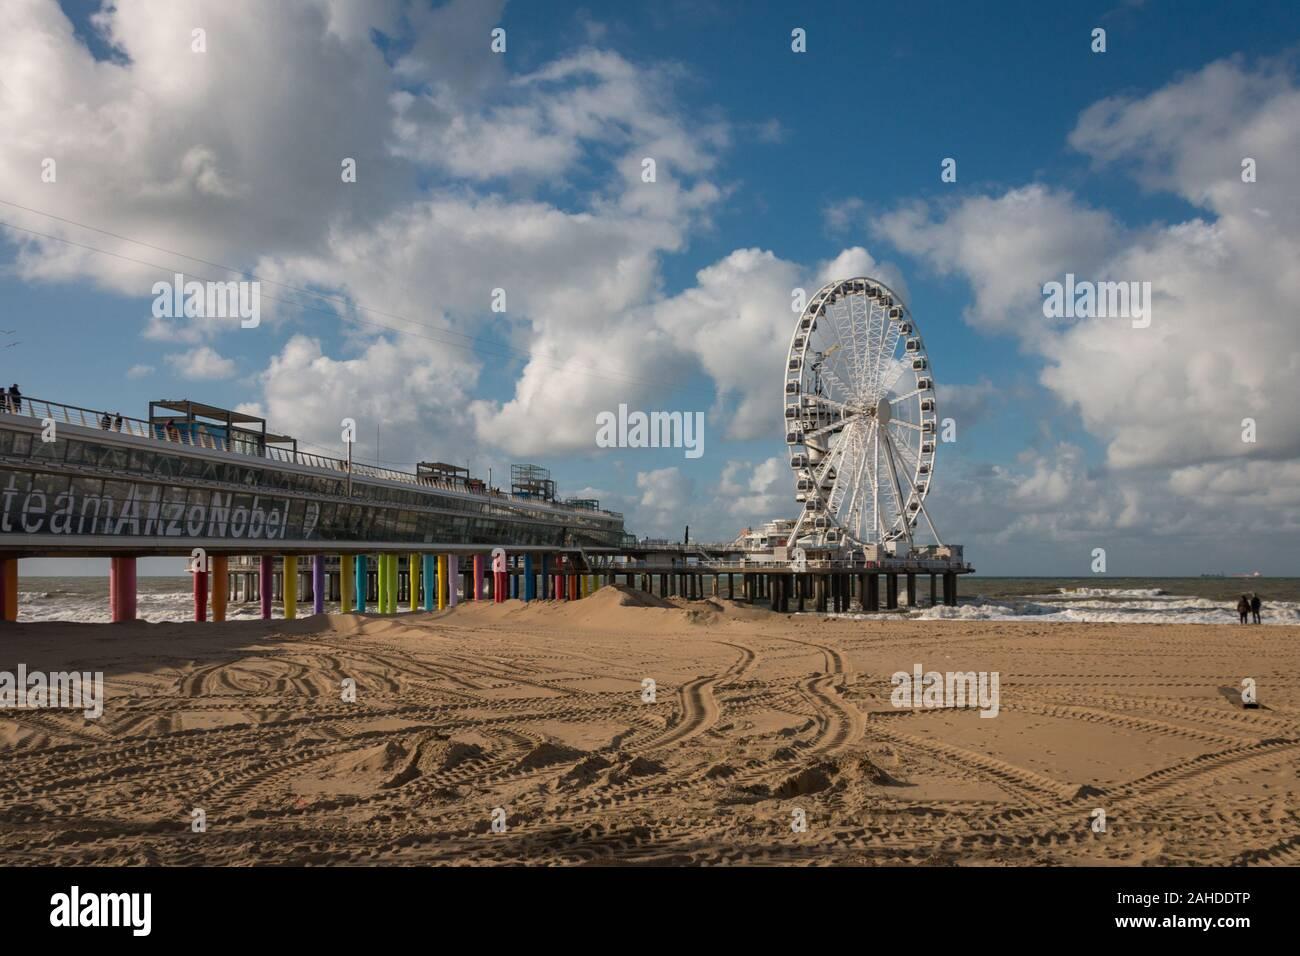 Scheveningen, the Netherlands - October 3, 2017: Pier of Scheveningen with ferris wheel and bungee tower seen from the right side Stock Photo